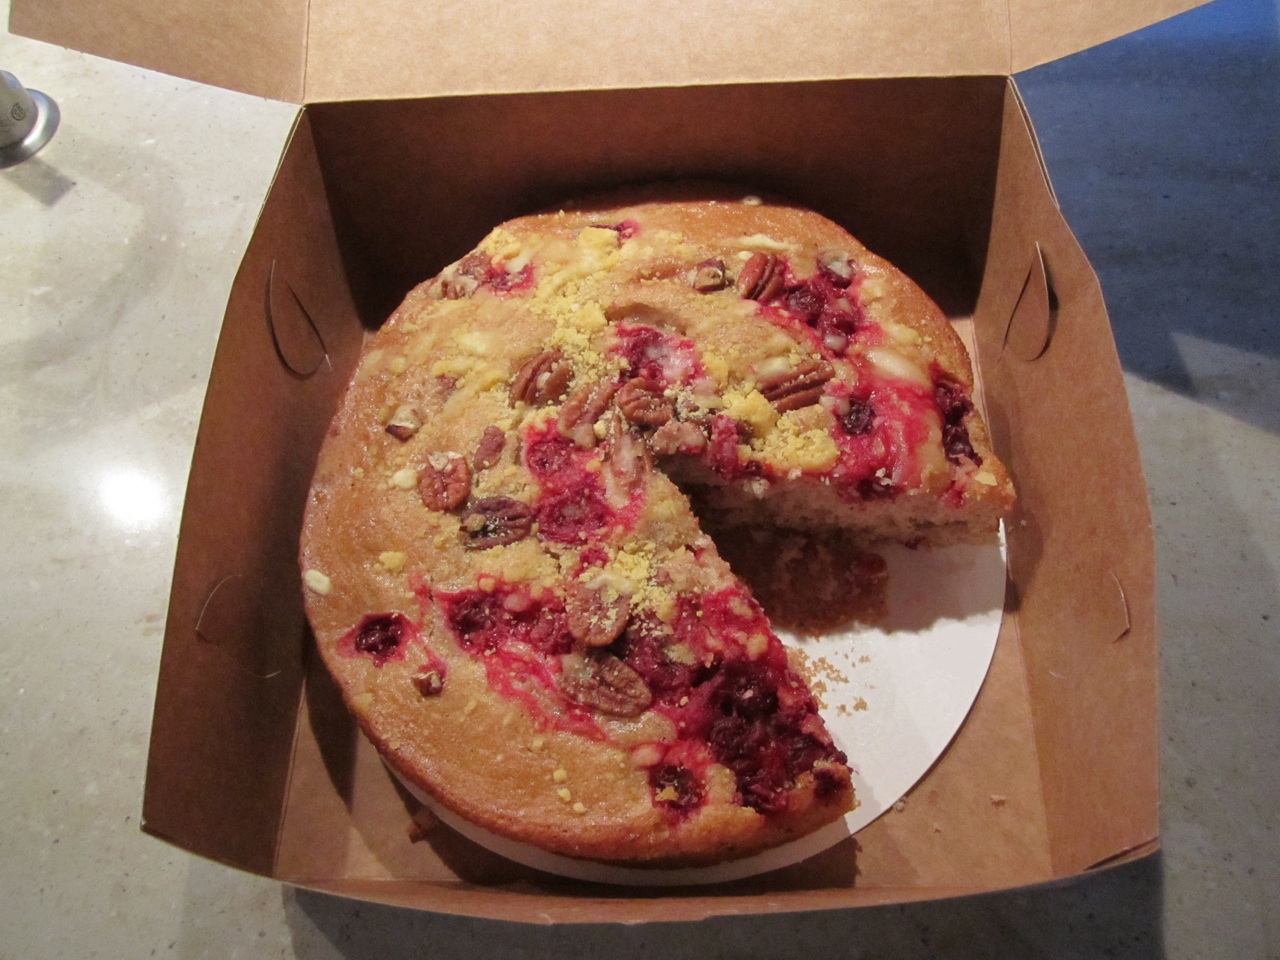 Cranberry Coffee Cake By Mazzetti's Bakery